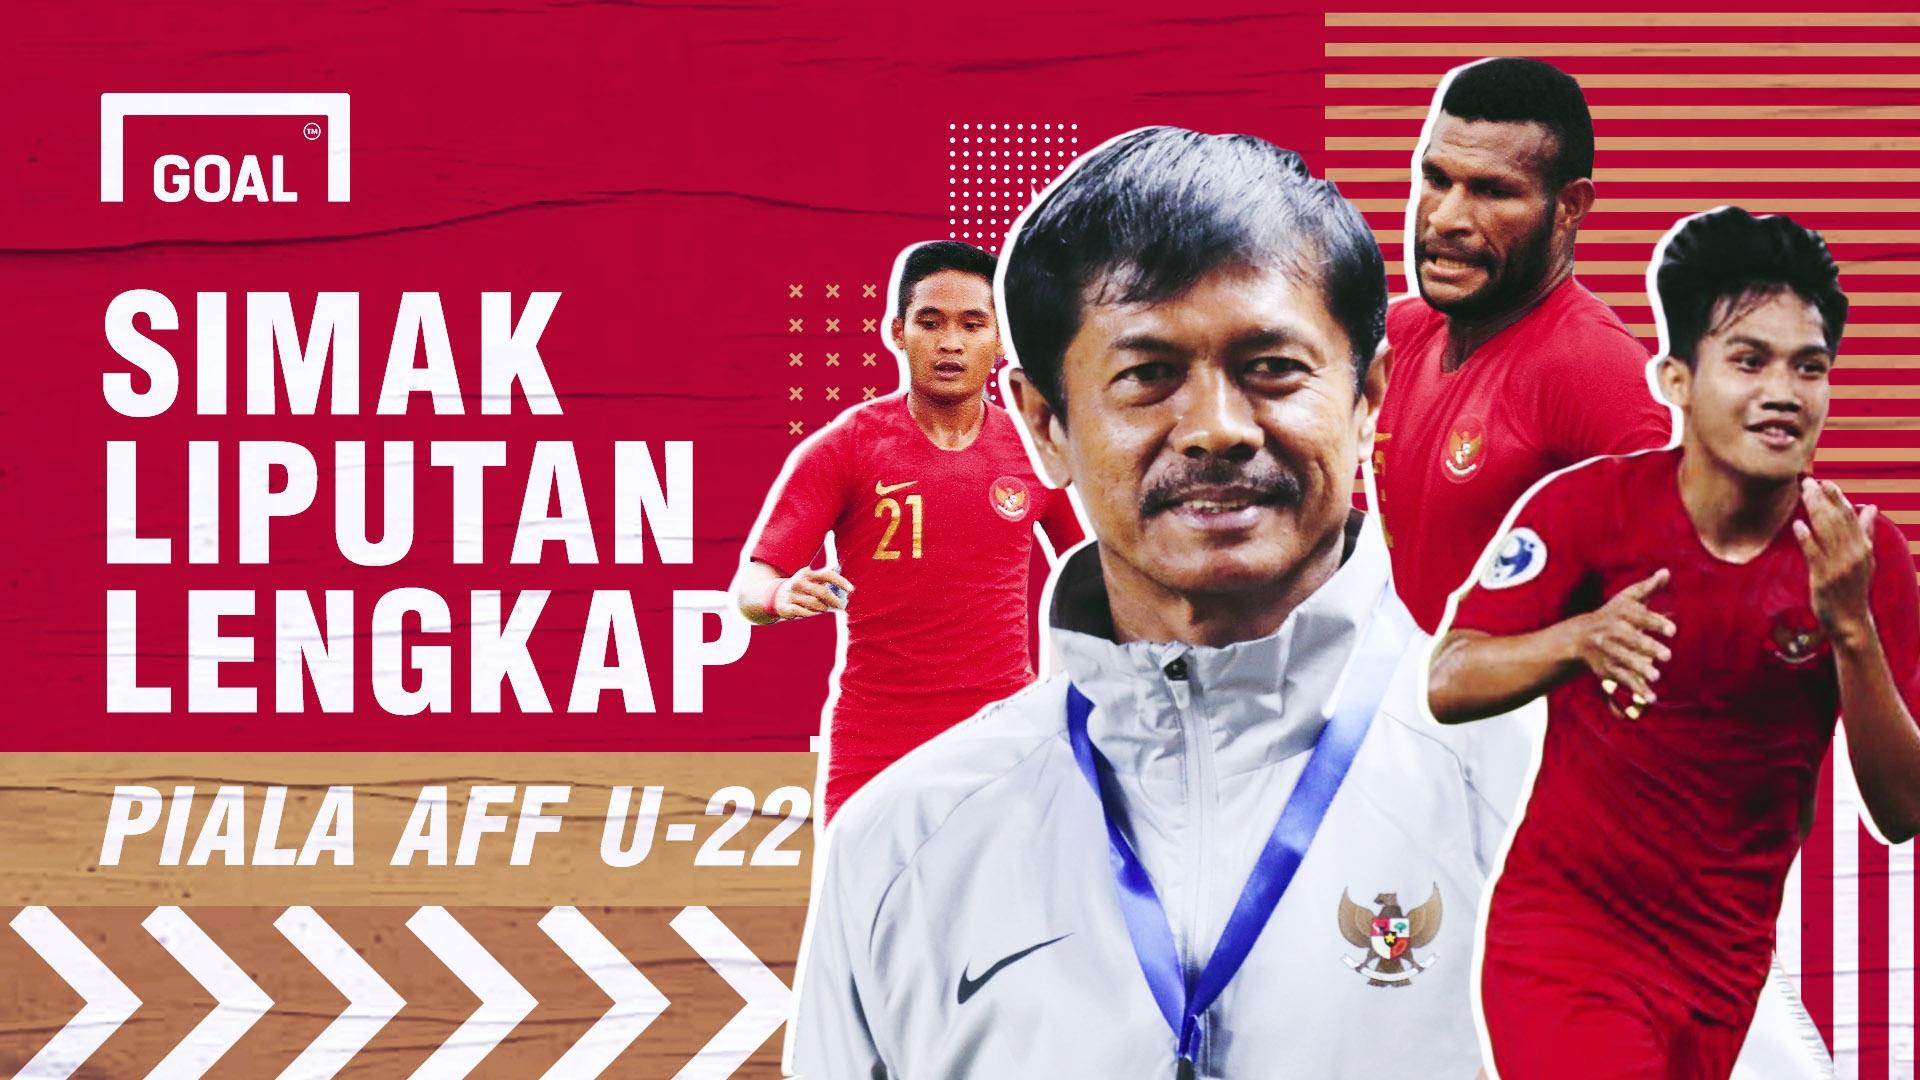 Footer Piala AFF U-22